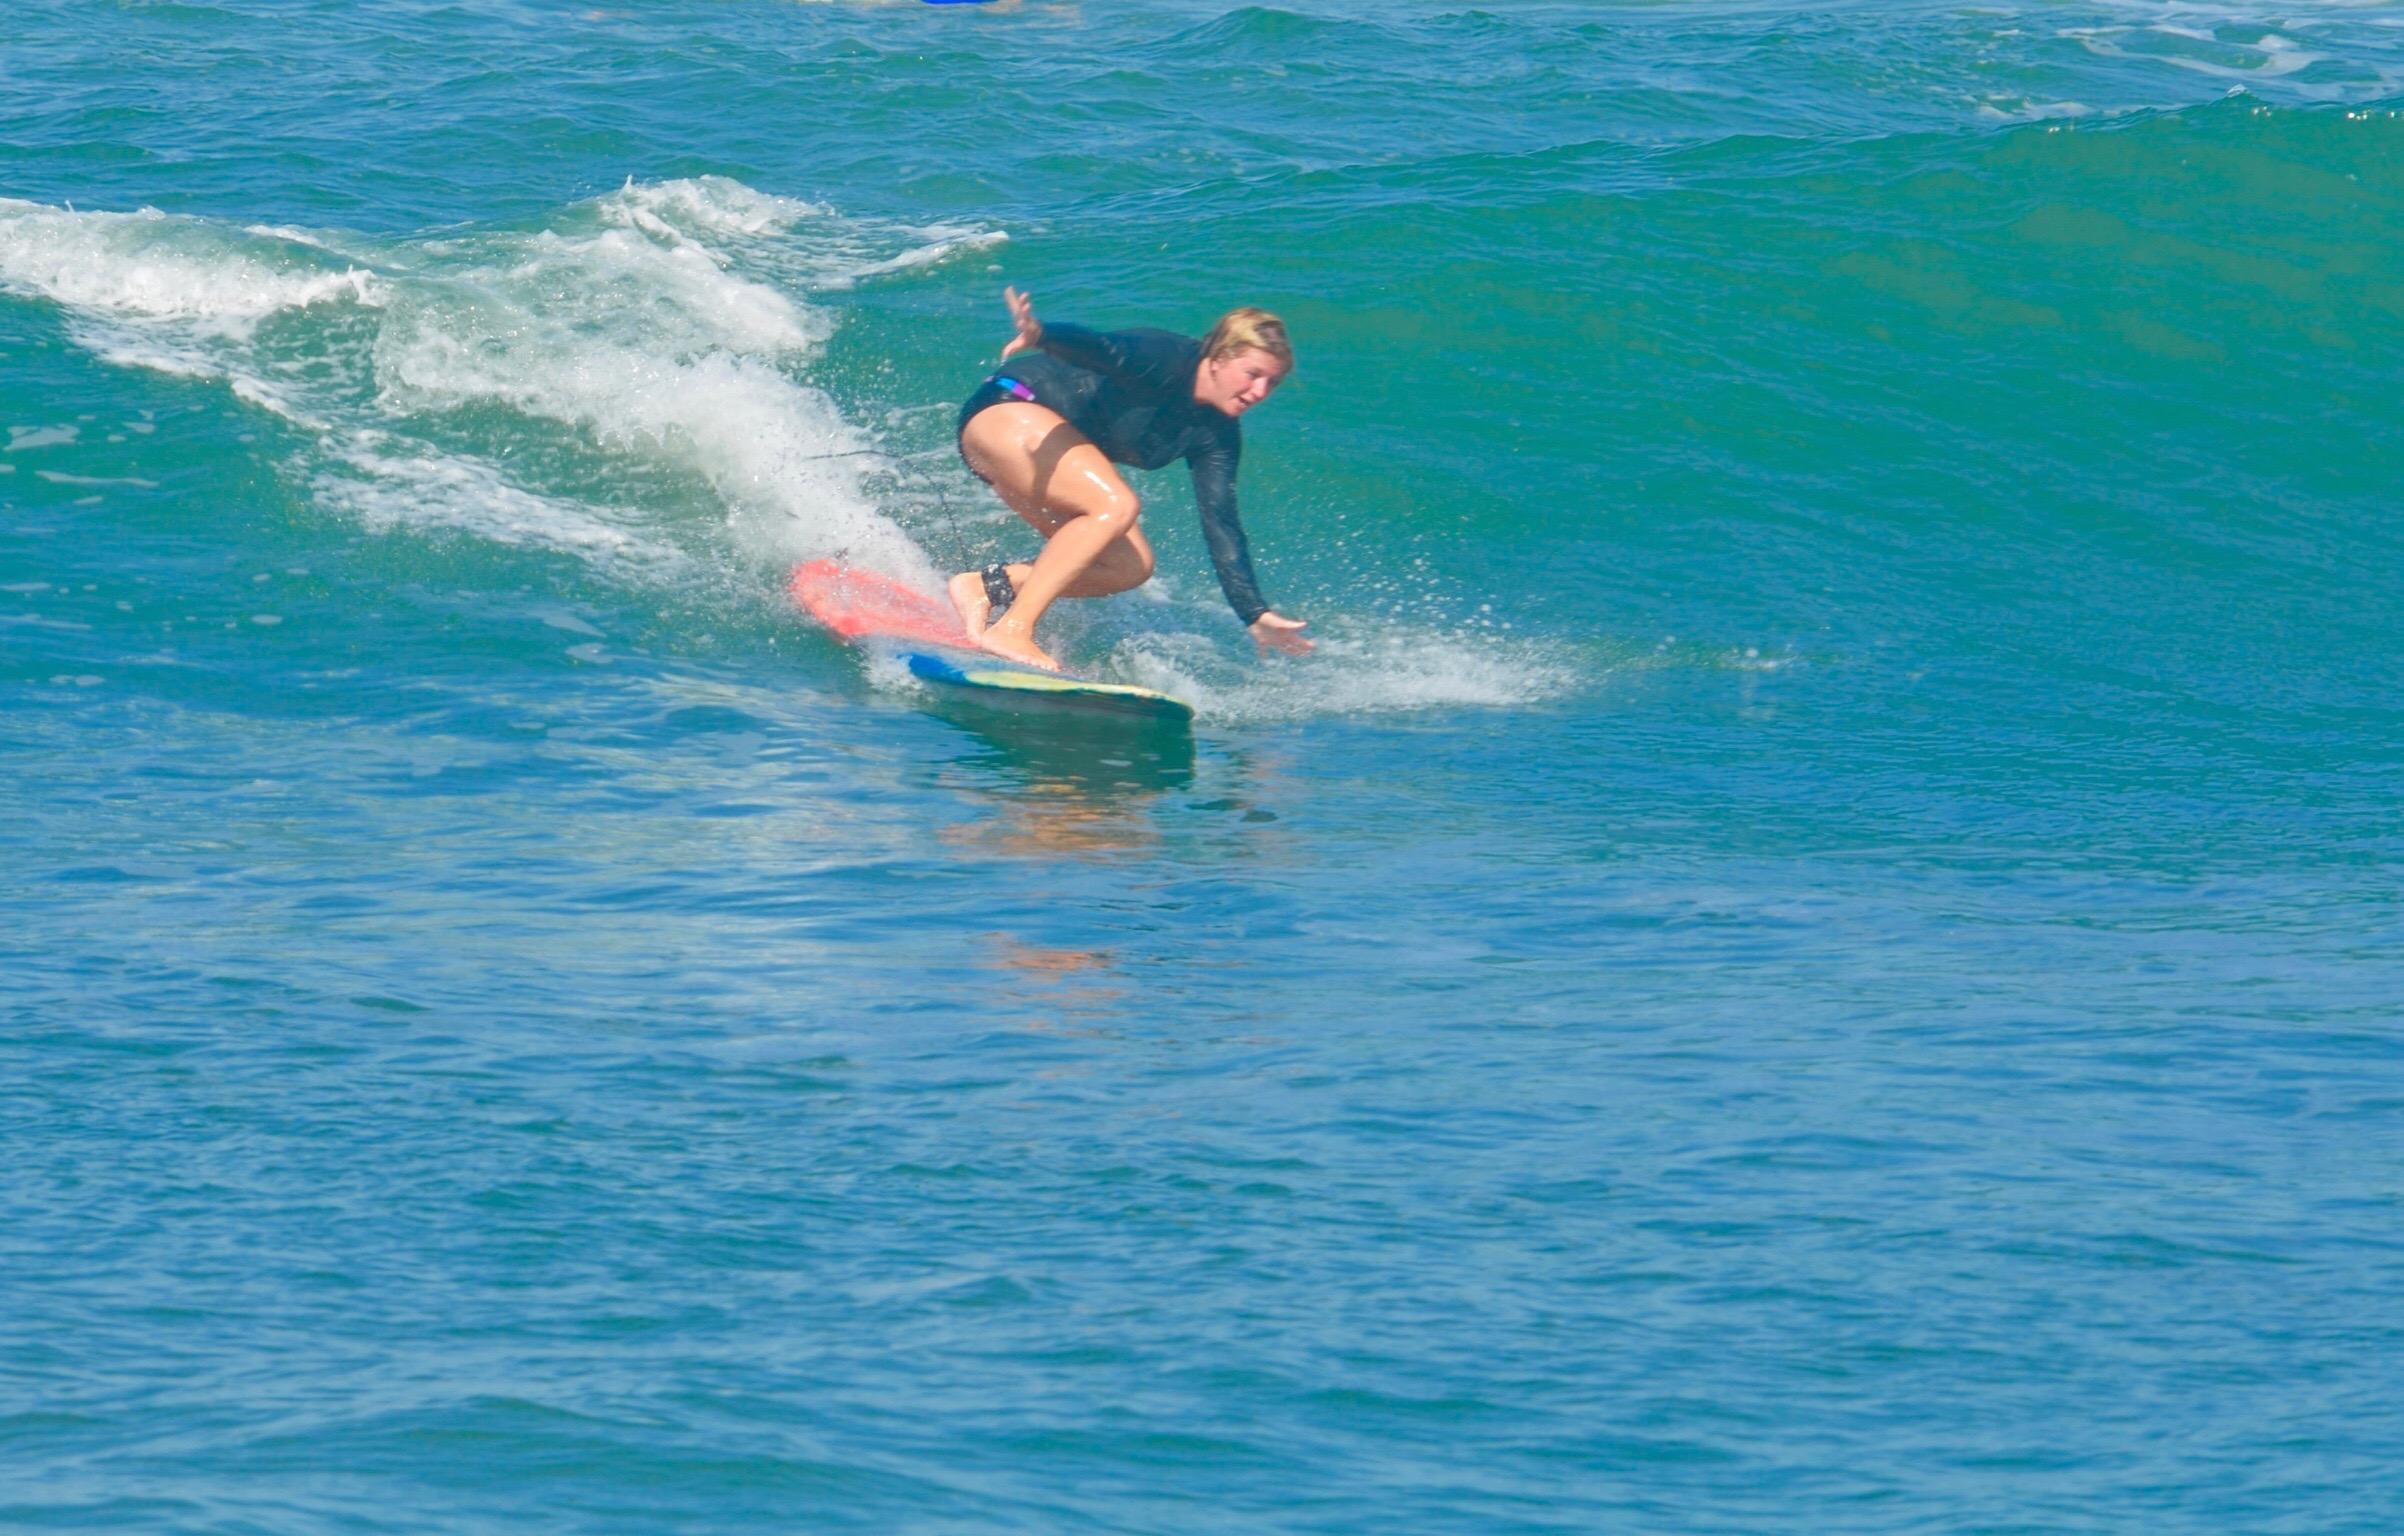 Surfing...sorta